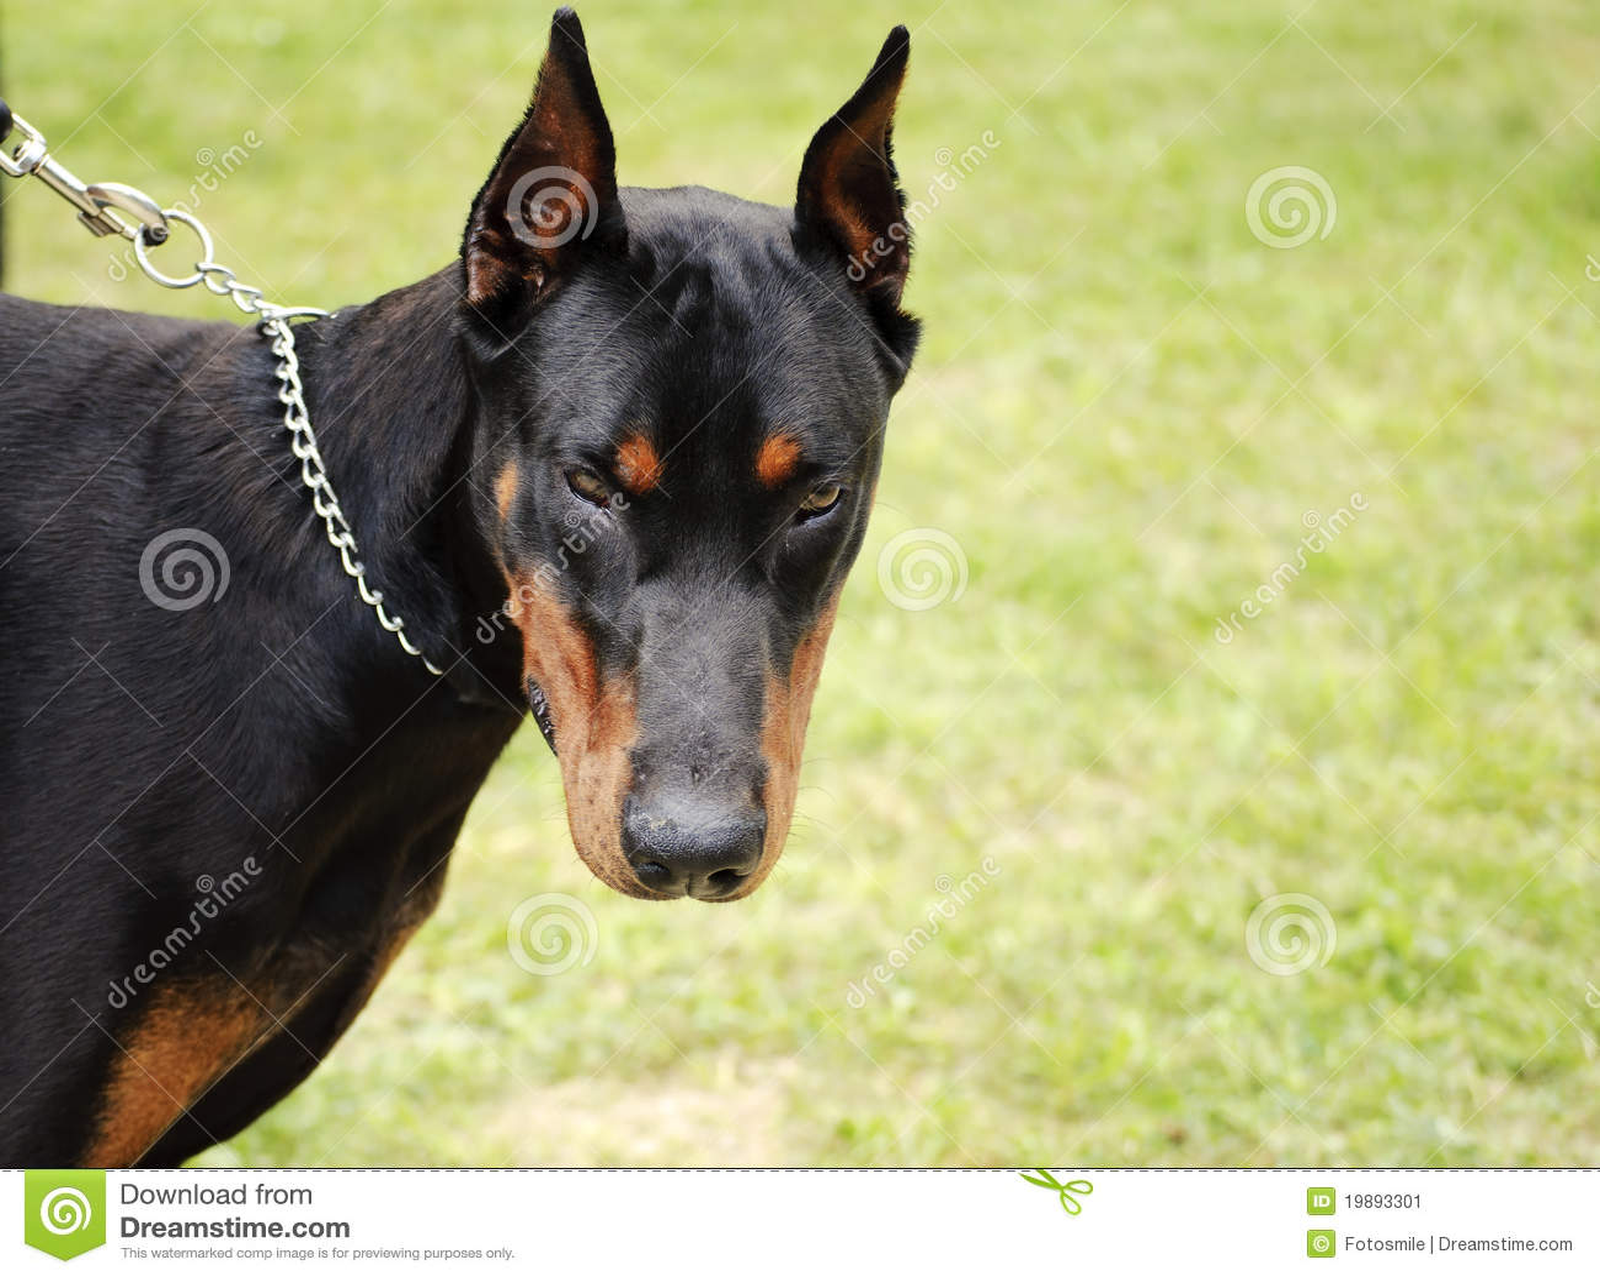 Scary Black Dog Breed